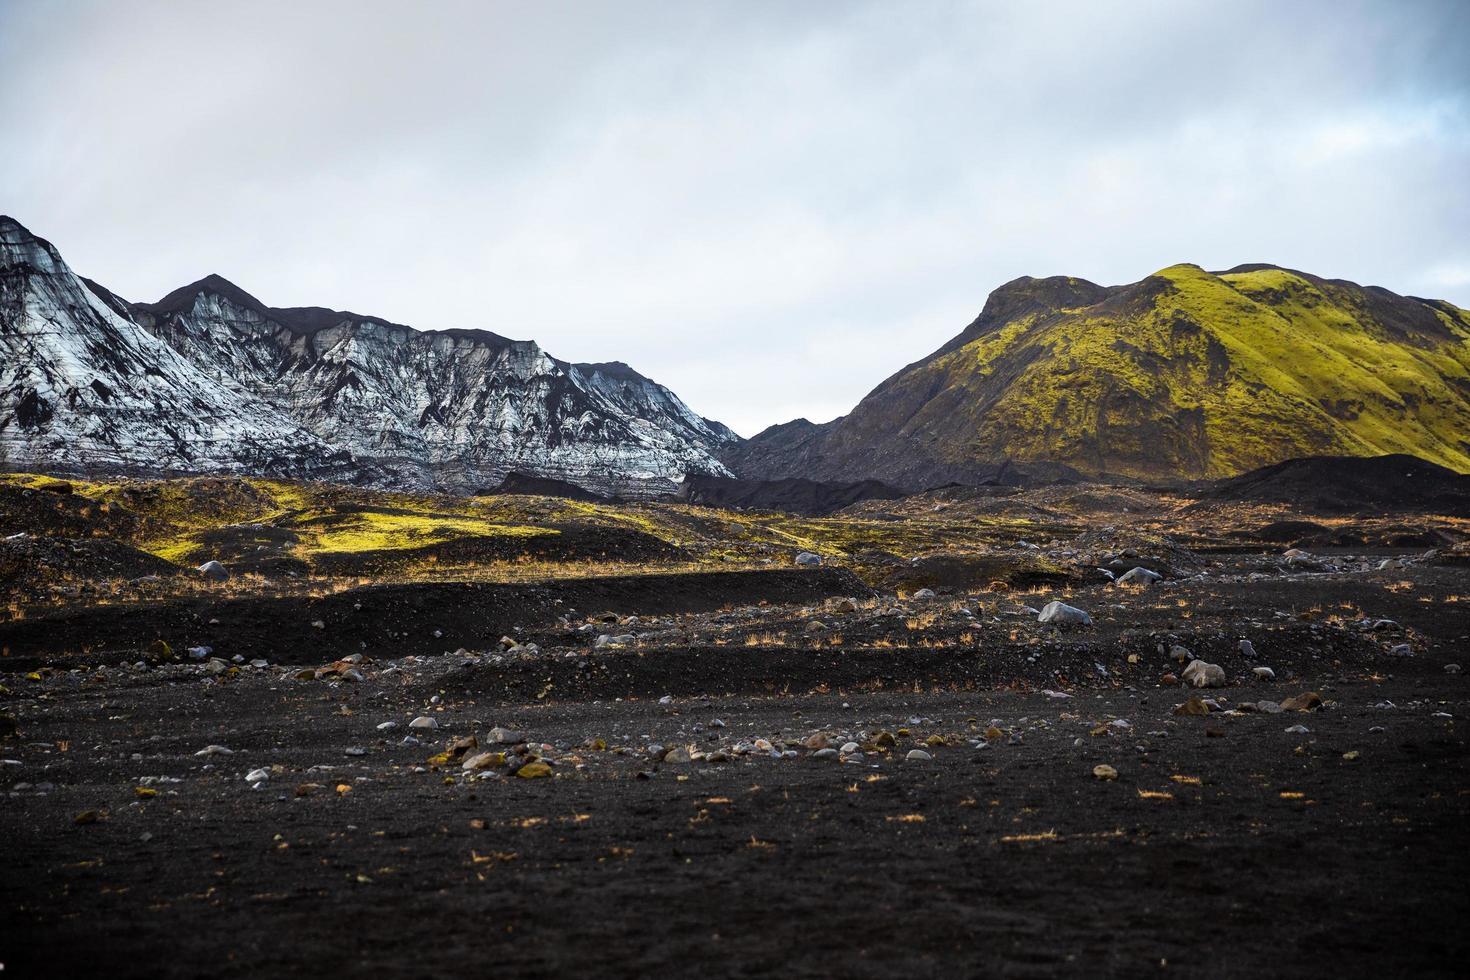 Gray and yellow mountain range across volcanic landscape photo